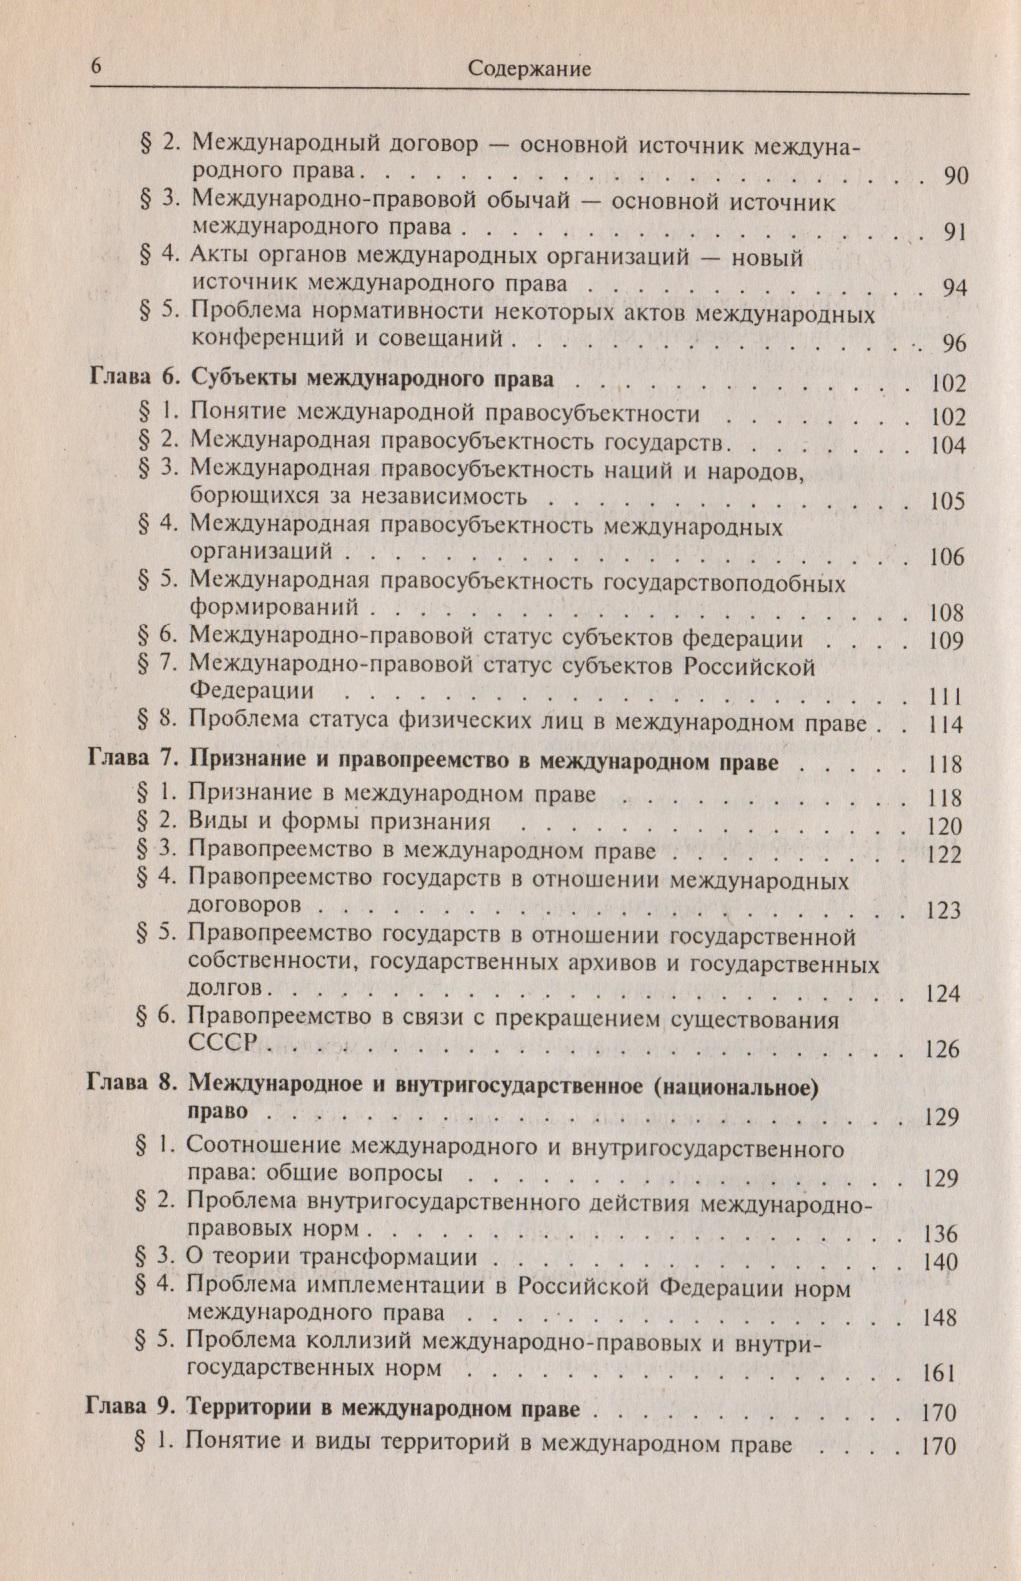 Учебник по международное право п н бирюков — pic 15